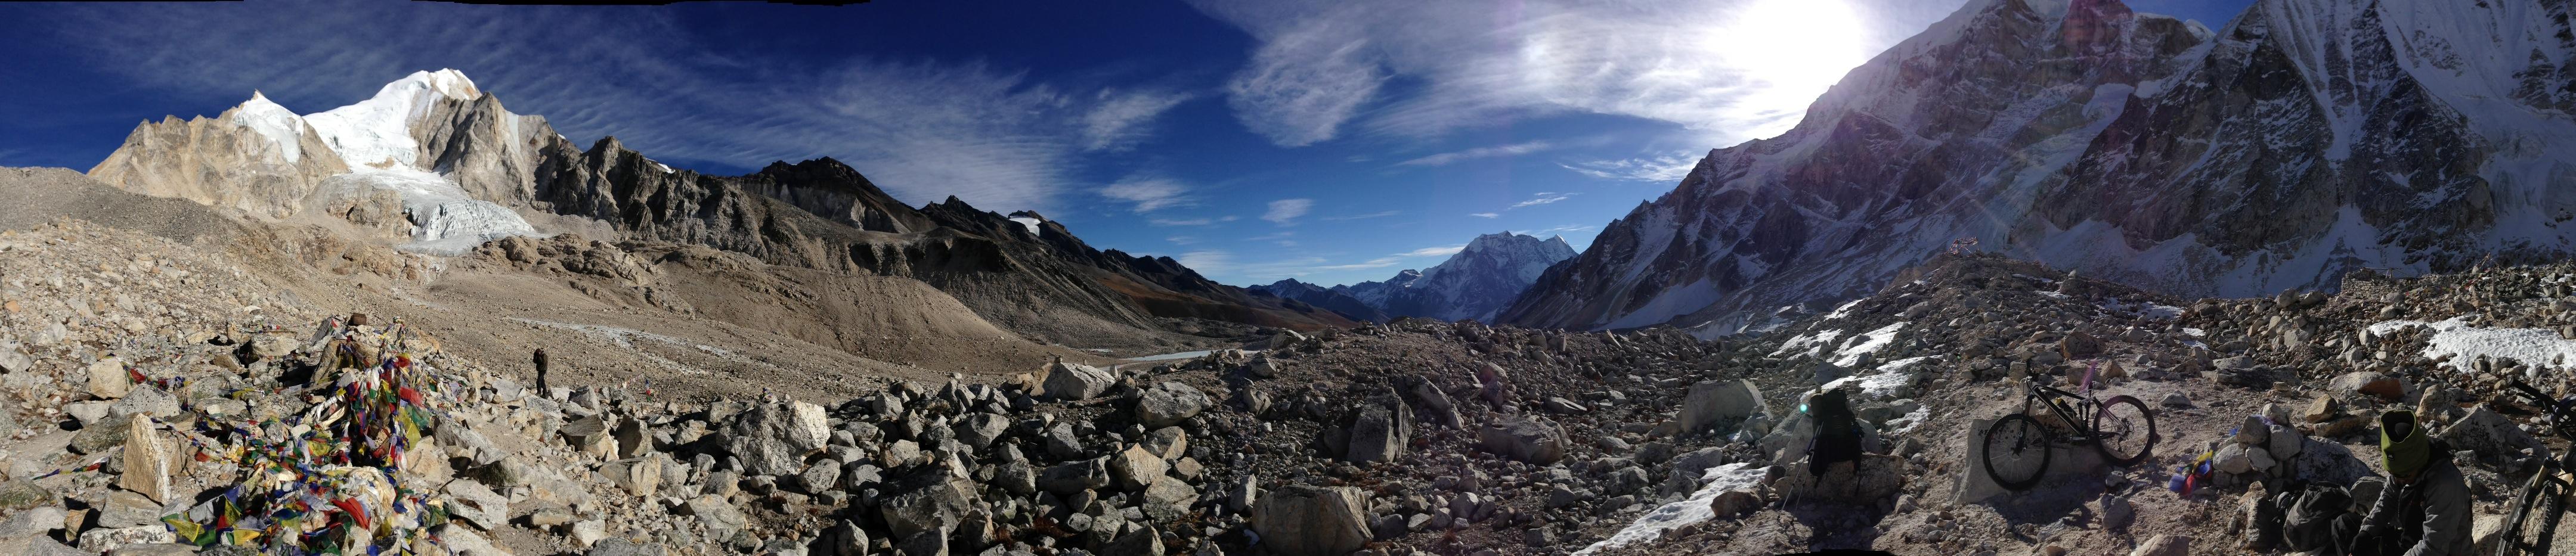 Auf dem Larke La Pass (5200 m)